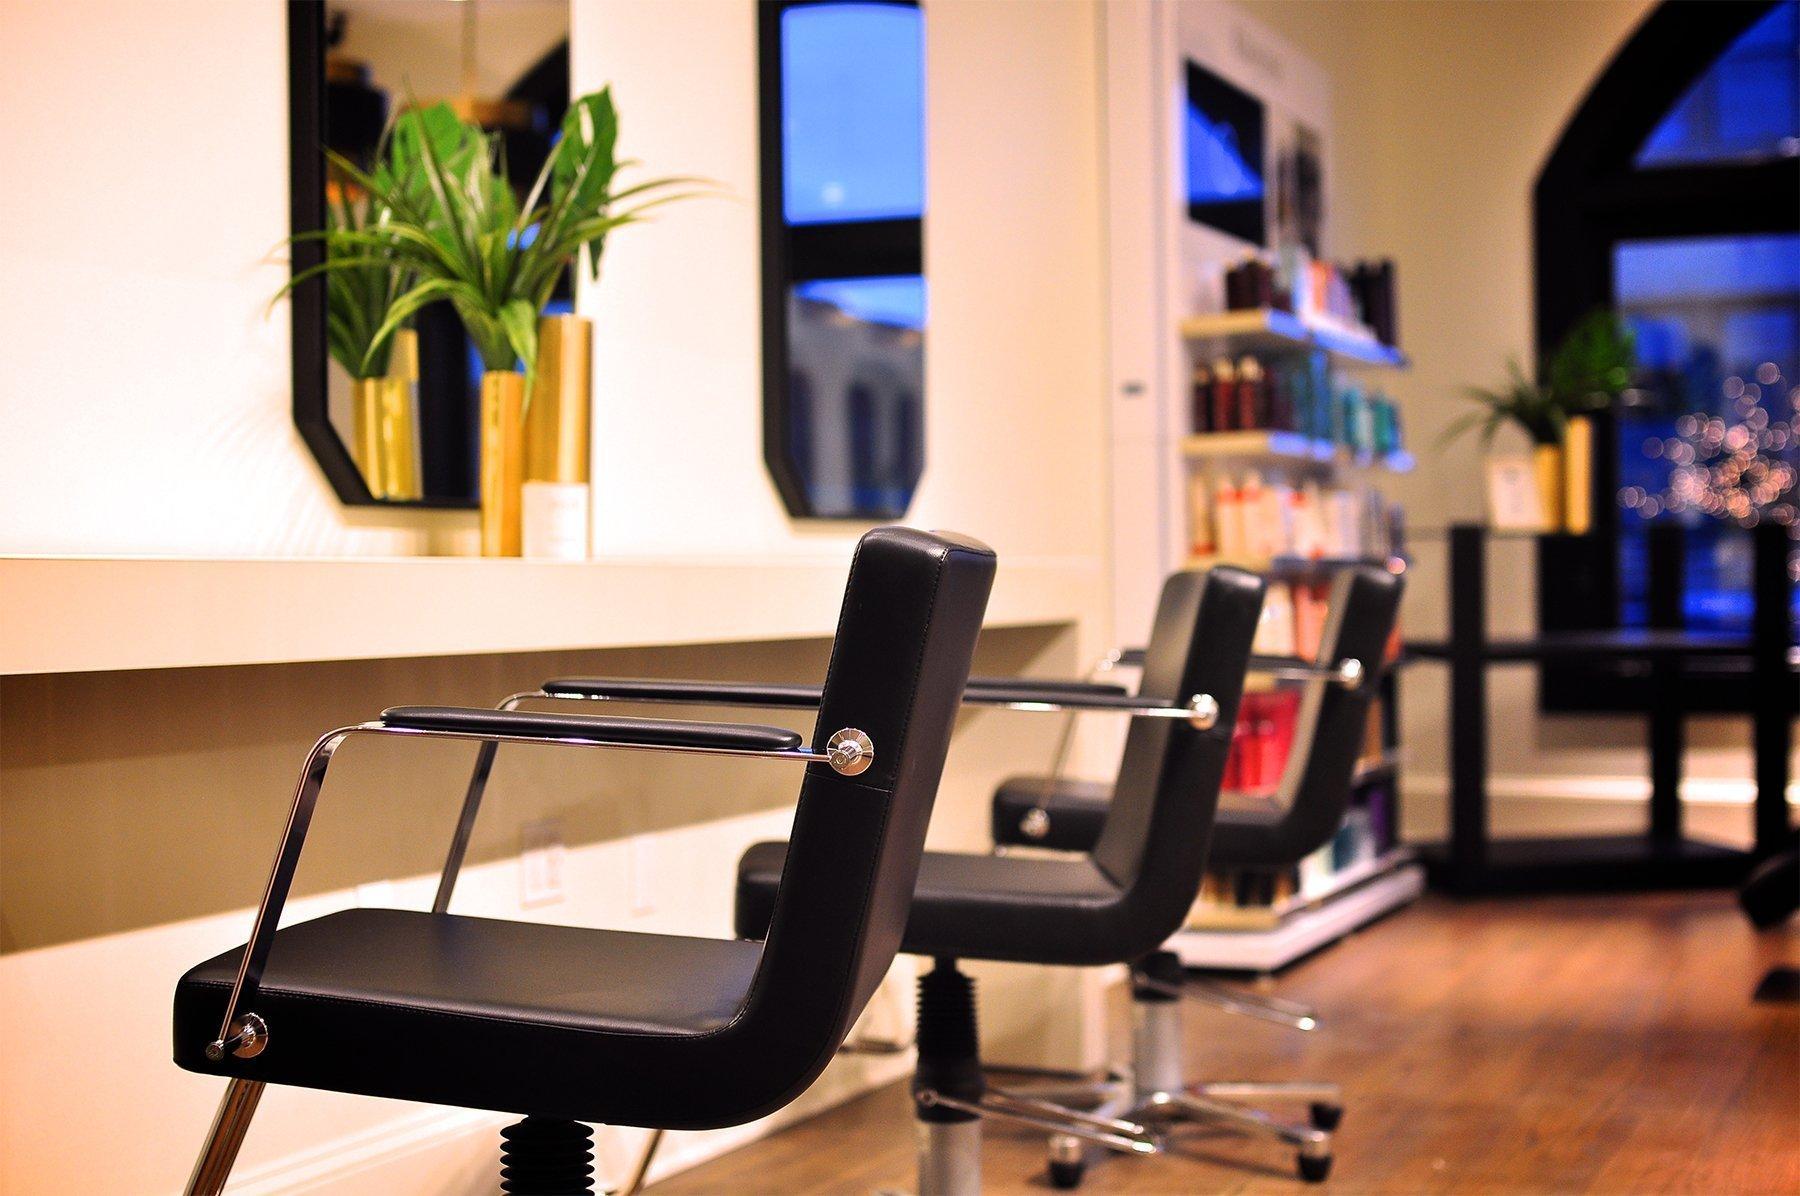 Gallery - Yanni Erbeli Wisteria - Hair Styles and Shop